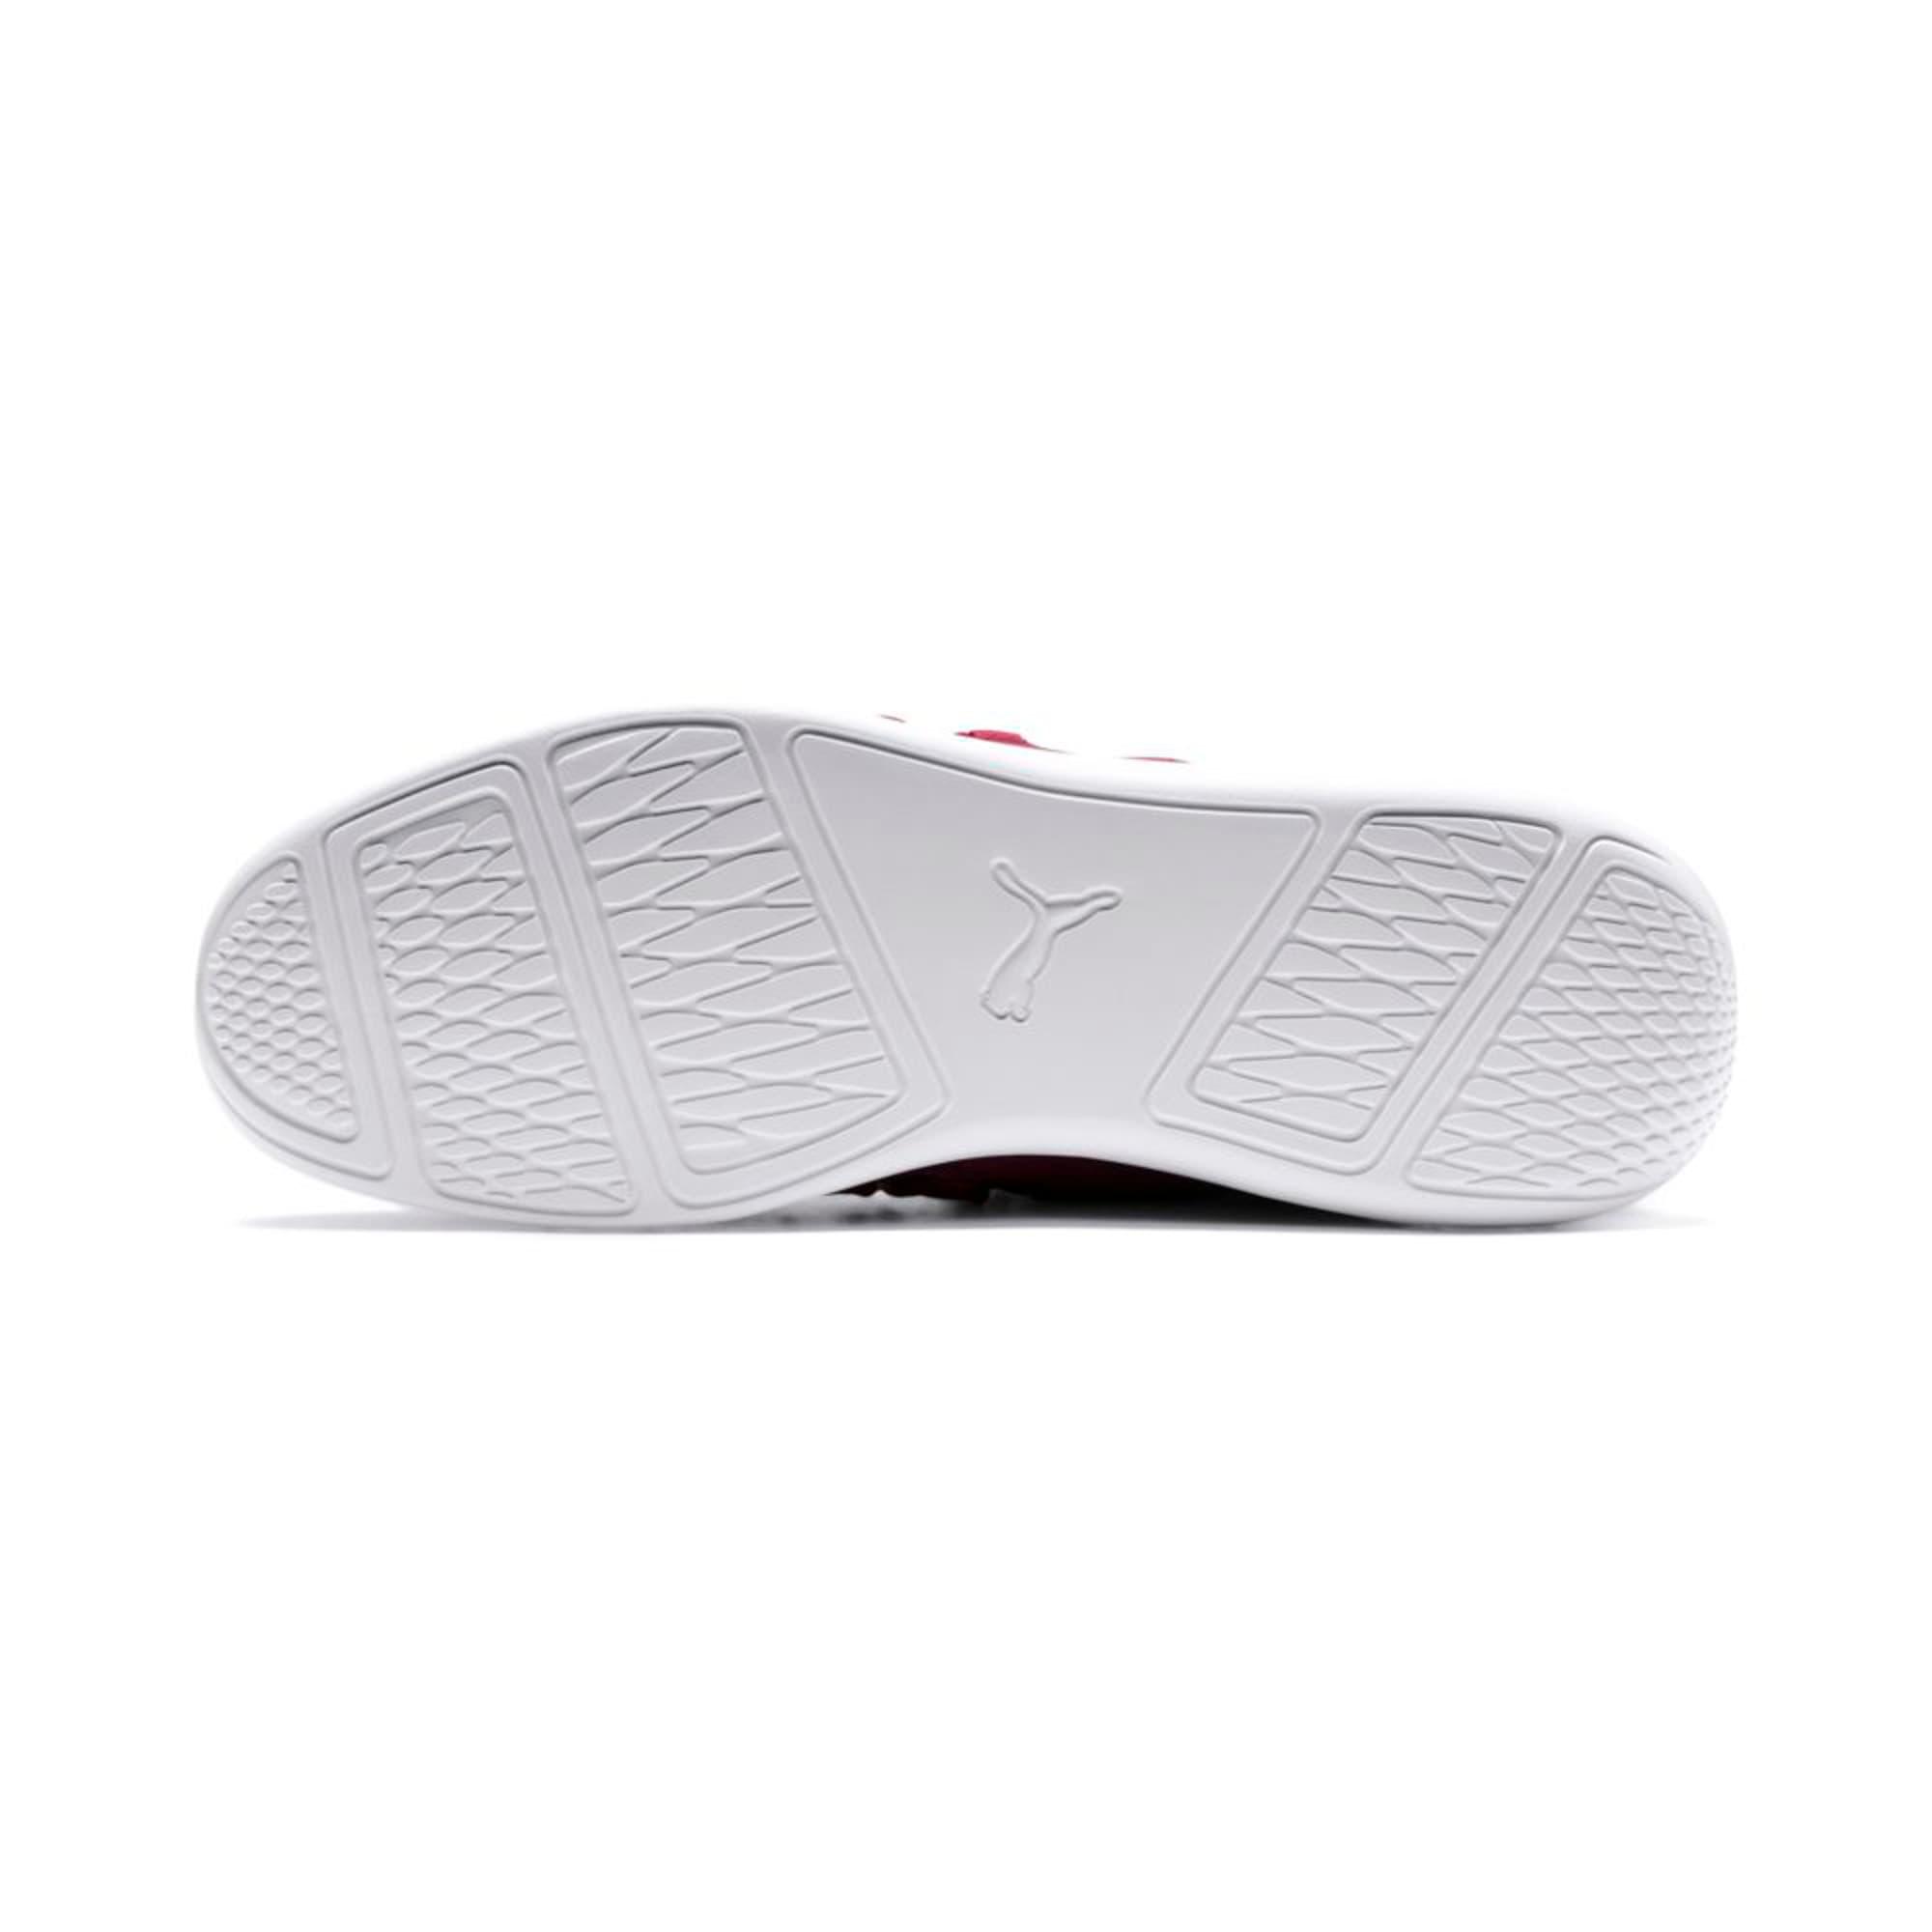 Thumbnail 4 of Ferrari Evo Cat Lace Lifestyle Shoes, Pomegranate-Bossa Nova-Wht, medium-IND